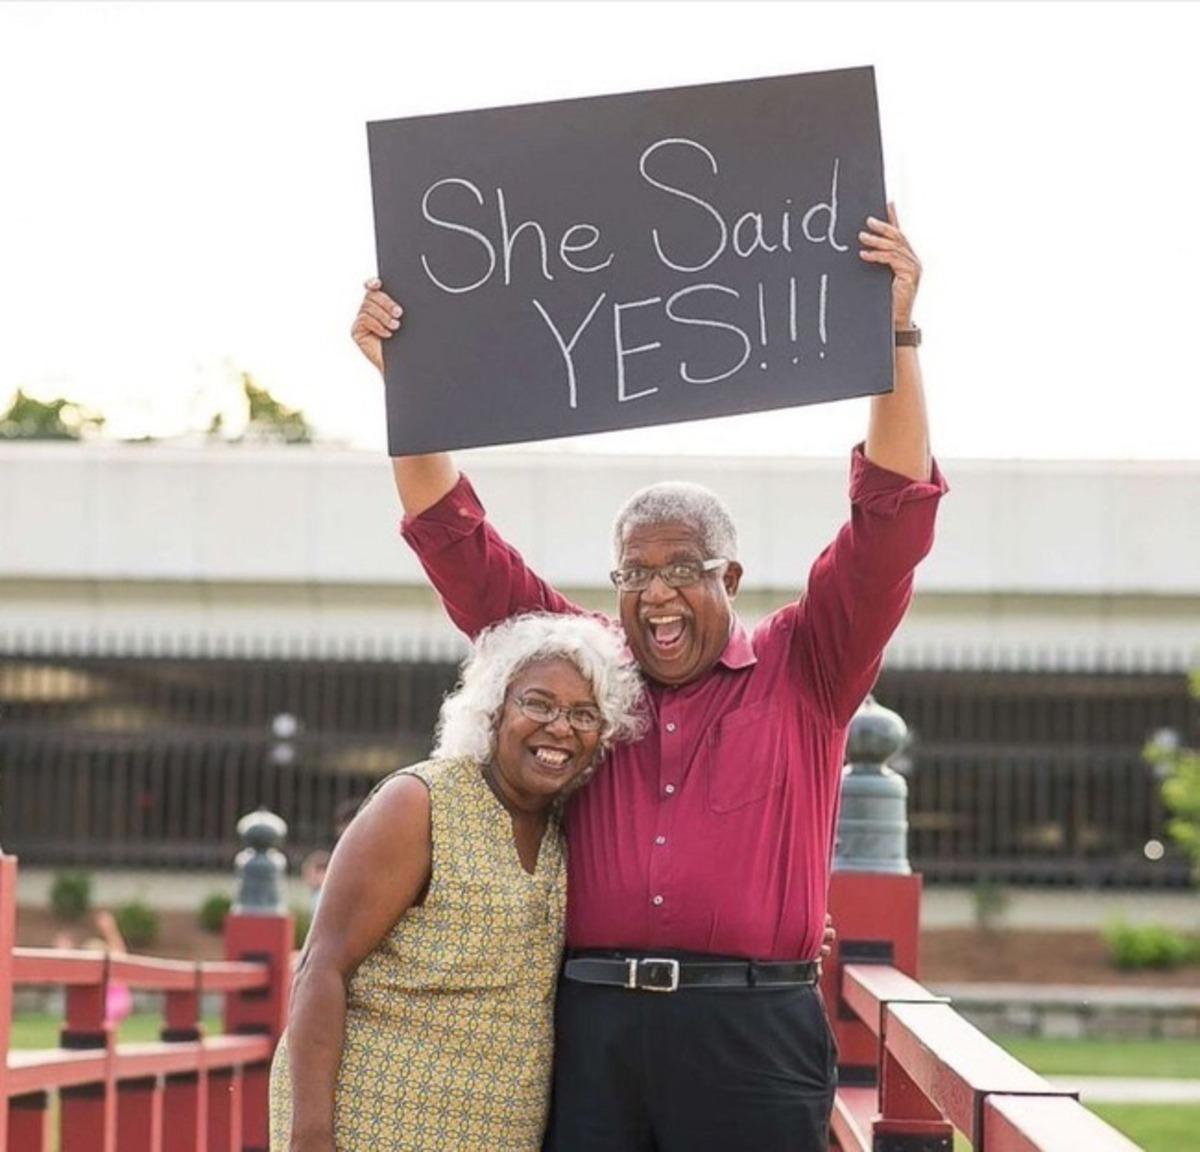 Ela disse sim ao pedido de casamento dele